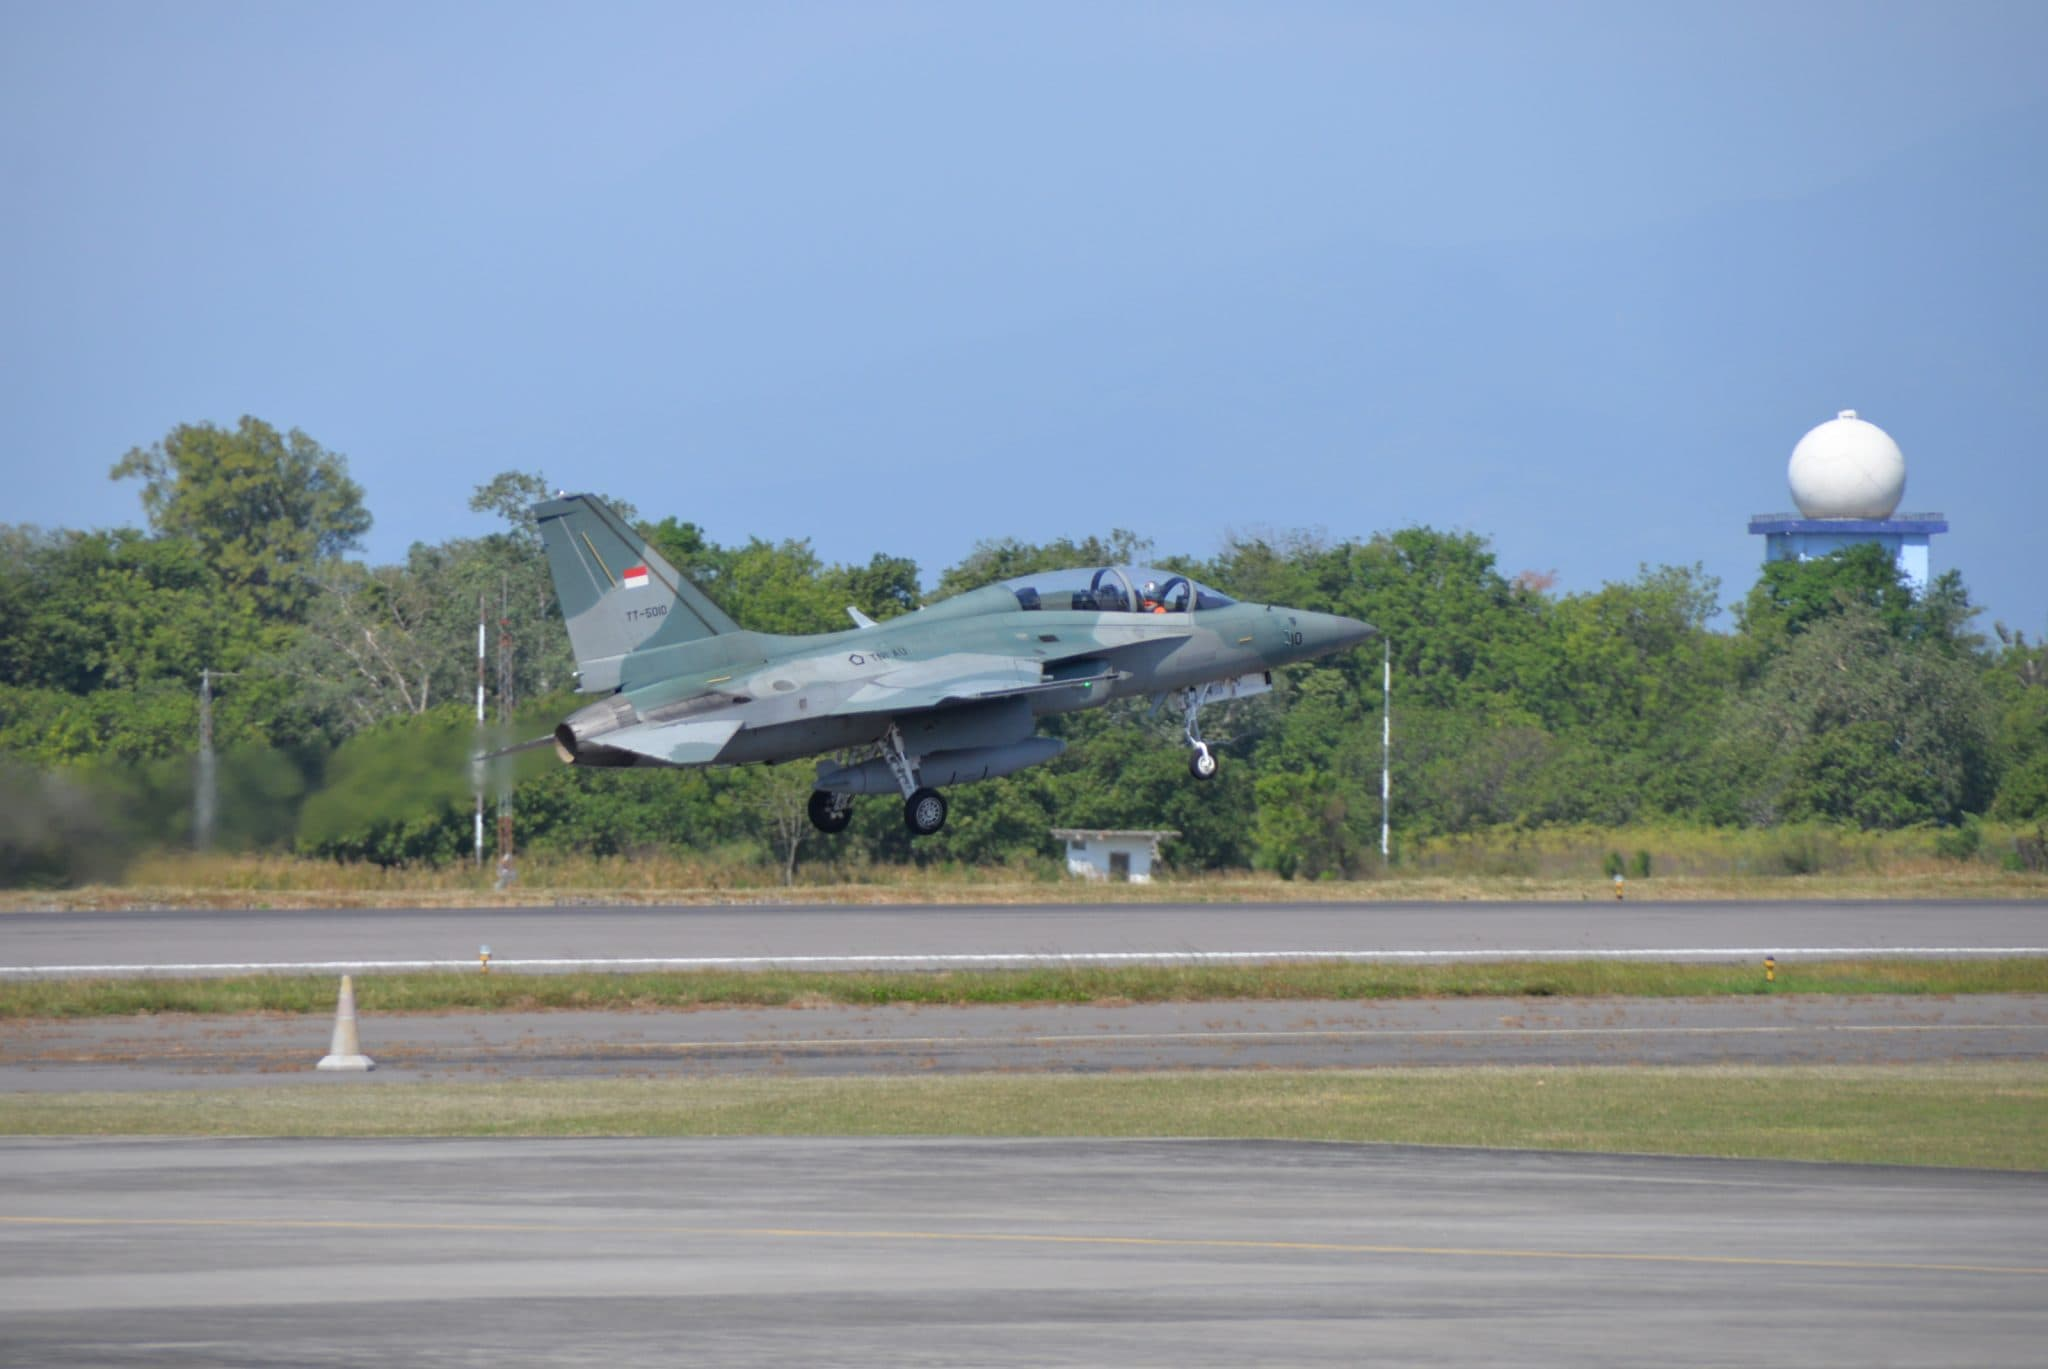 4 Pesawat F 16 dan 4 Pesawat T50i TNI AU Latihan Perang